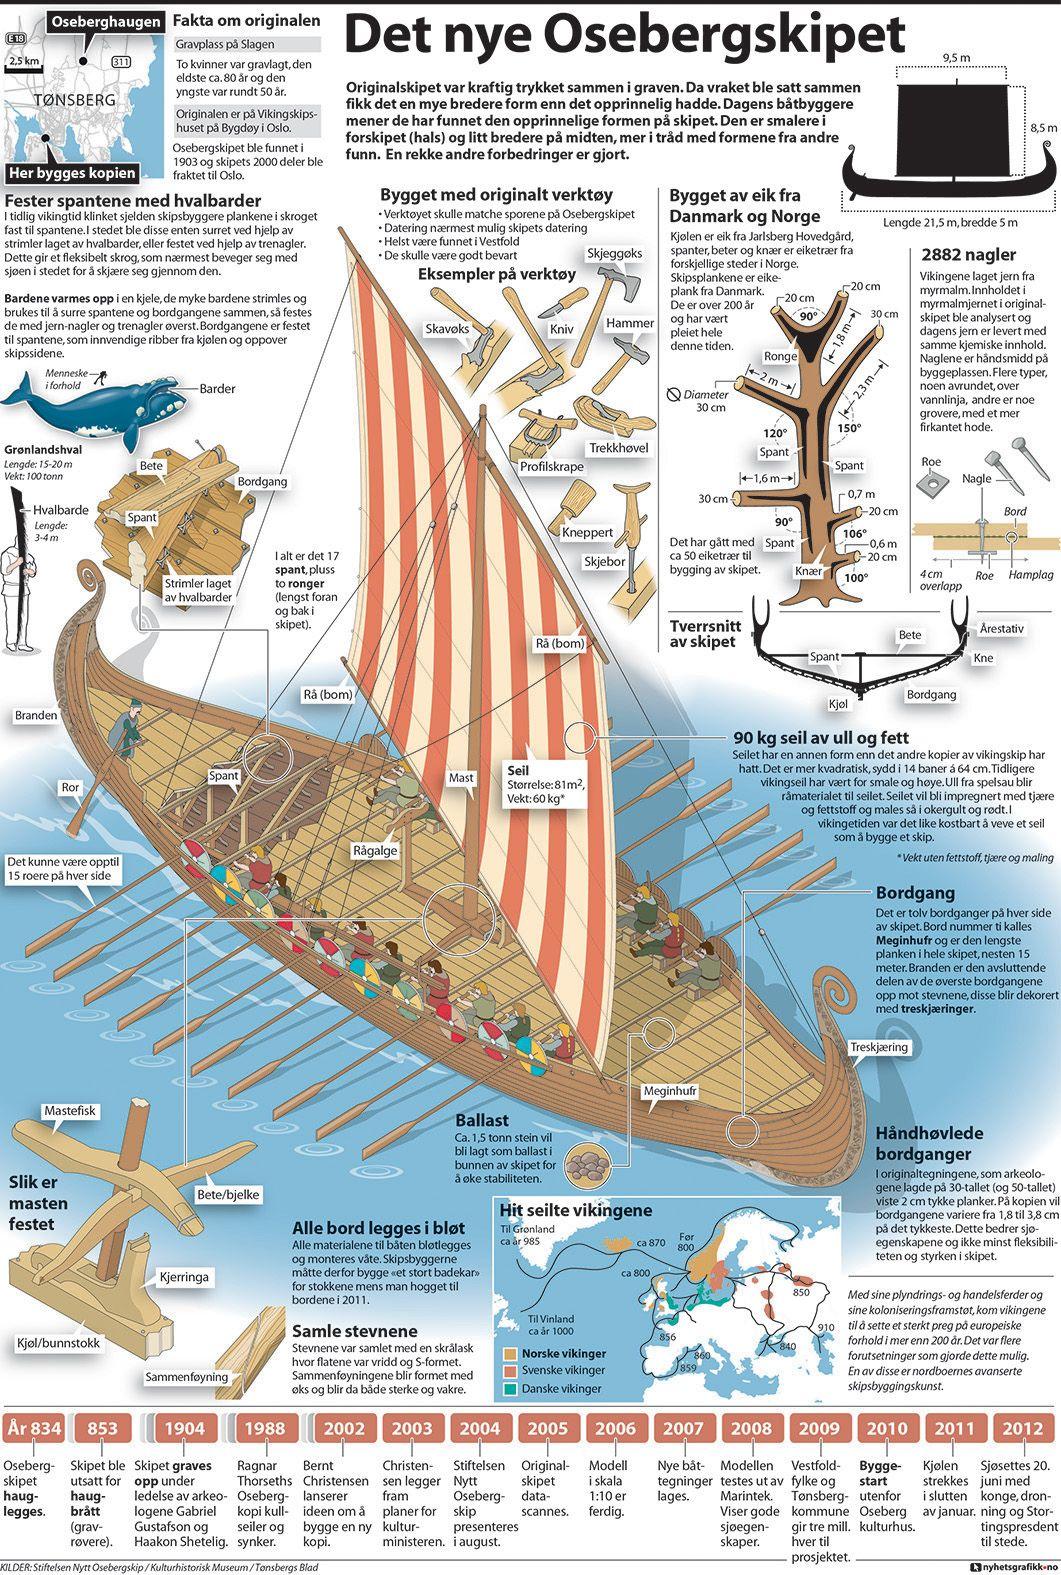 Nyhetsgrafikk Marco Vaglieri Oseberg Viking Ship Replica 2012 Pirate Diagram Piratediary